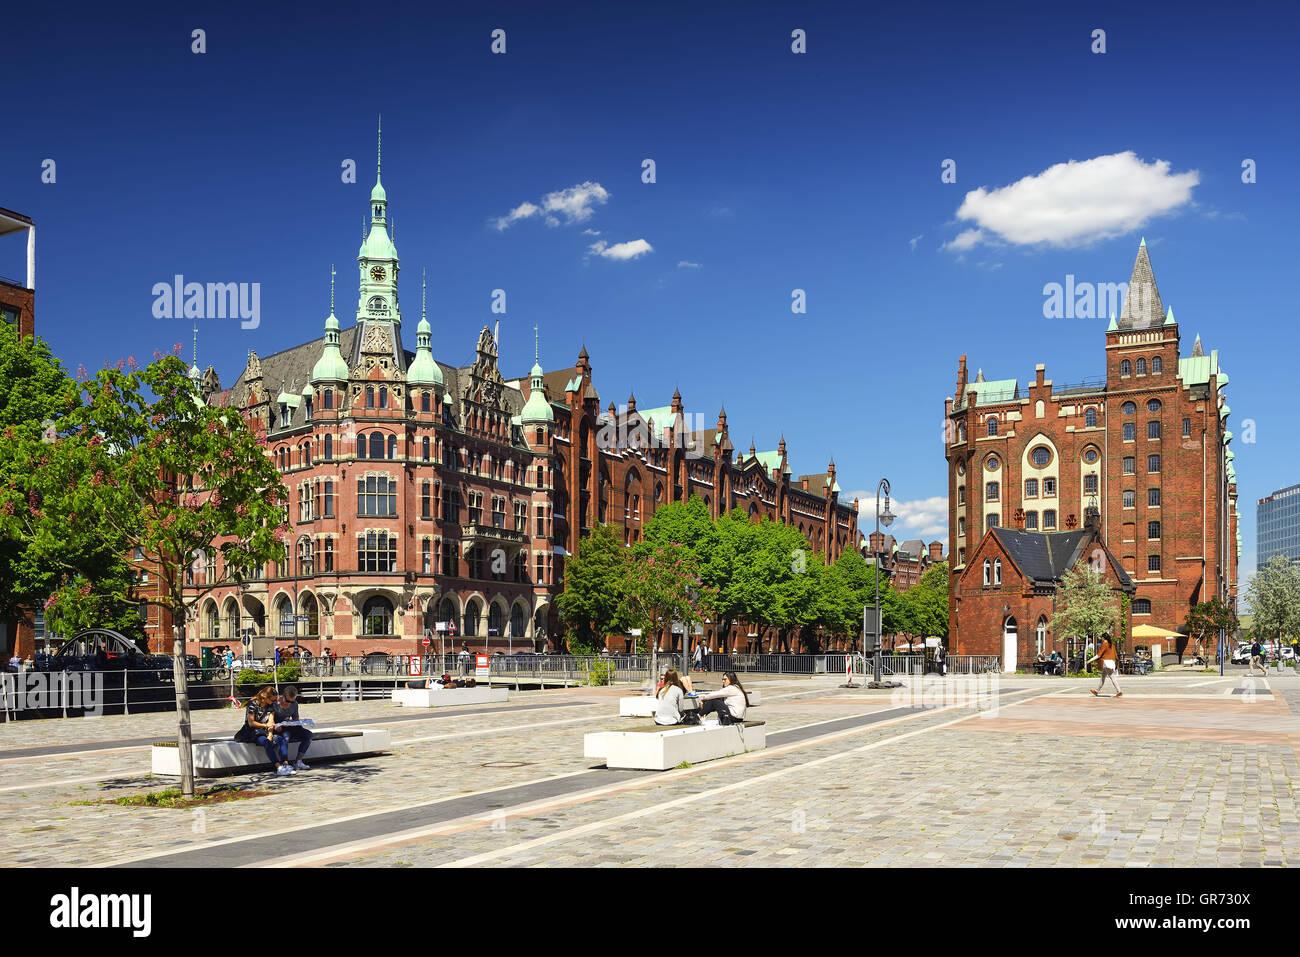 Storehouse District Speicherstadt In Hamburg, Germany - Stock Image